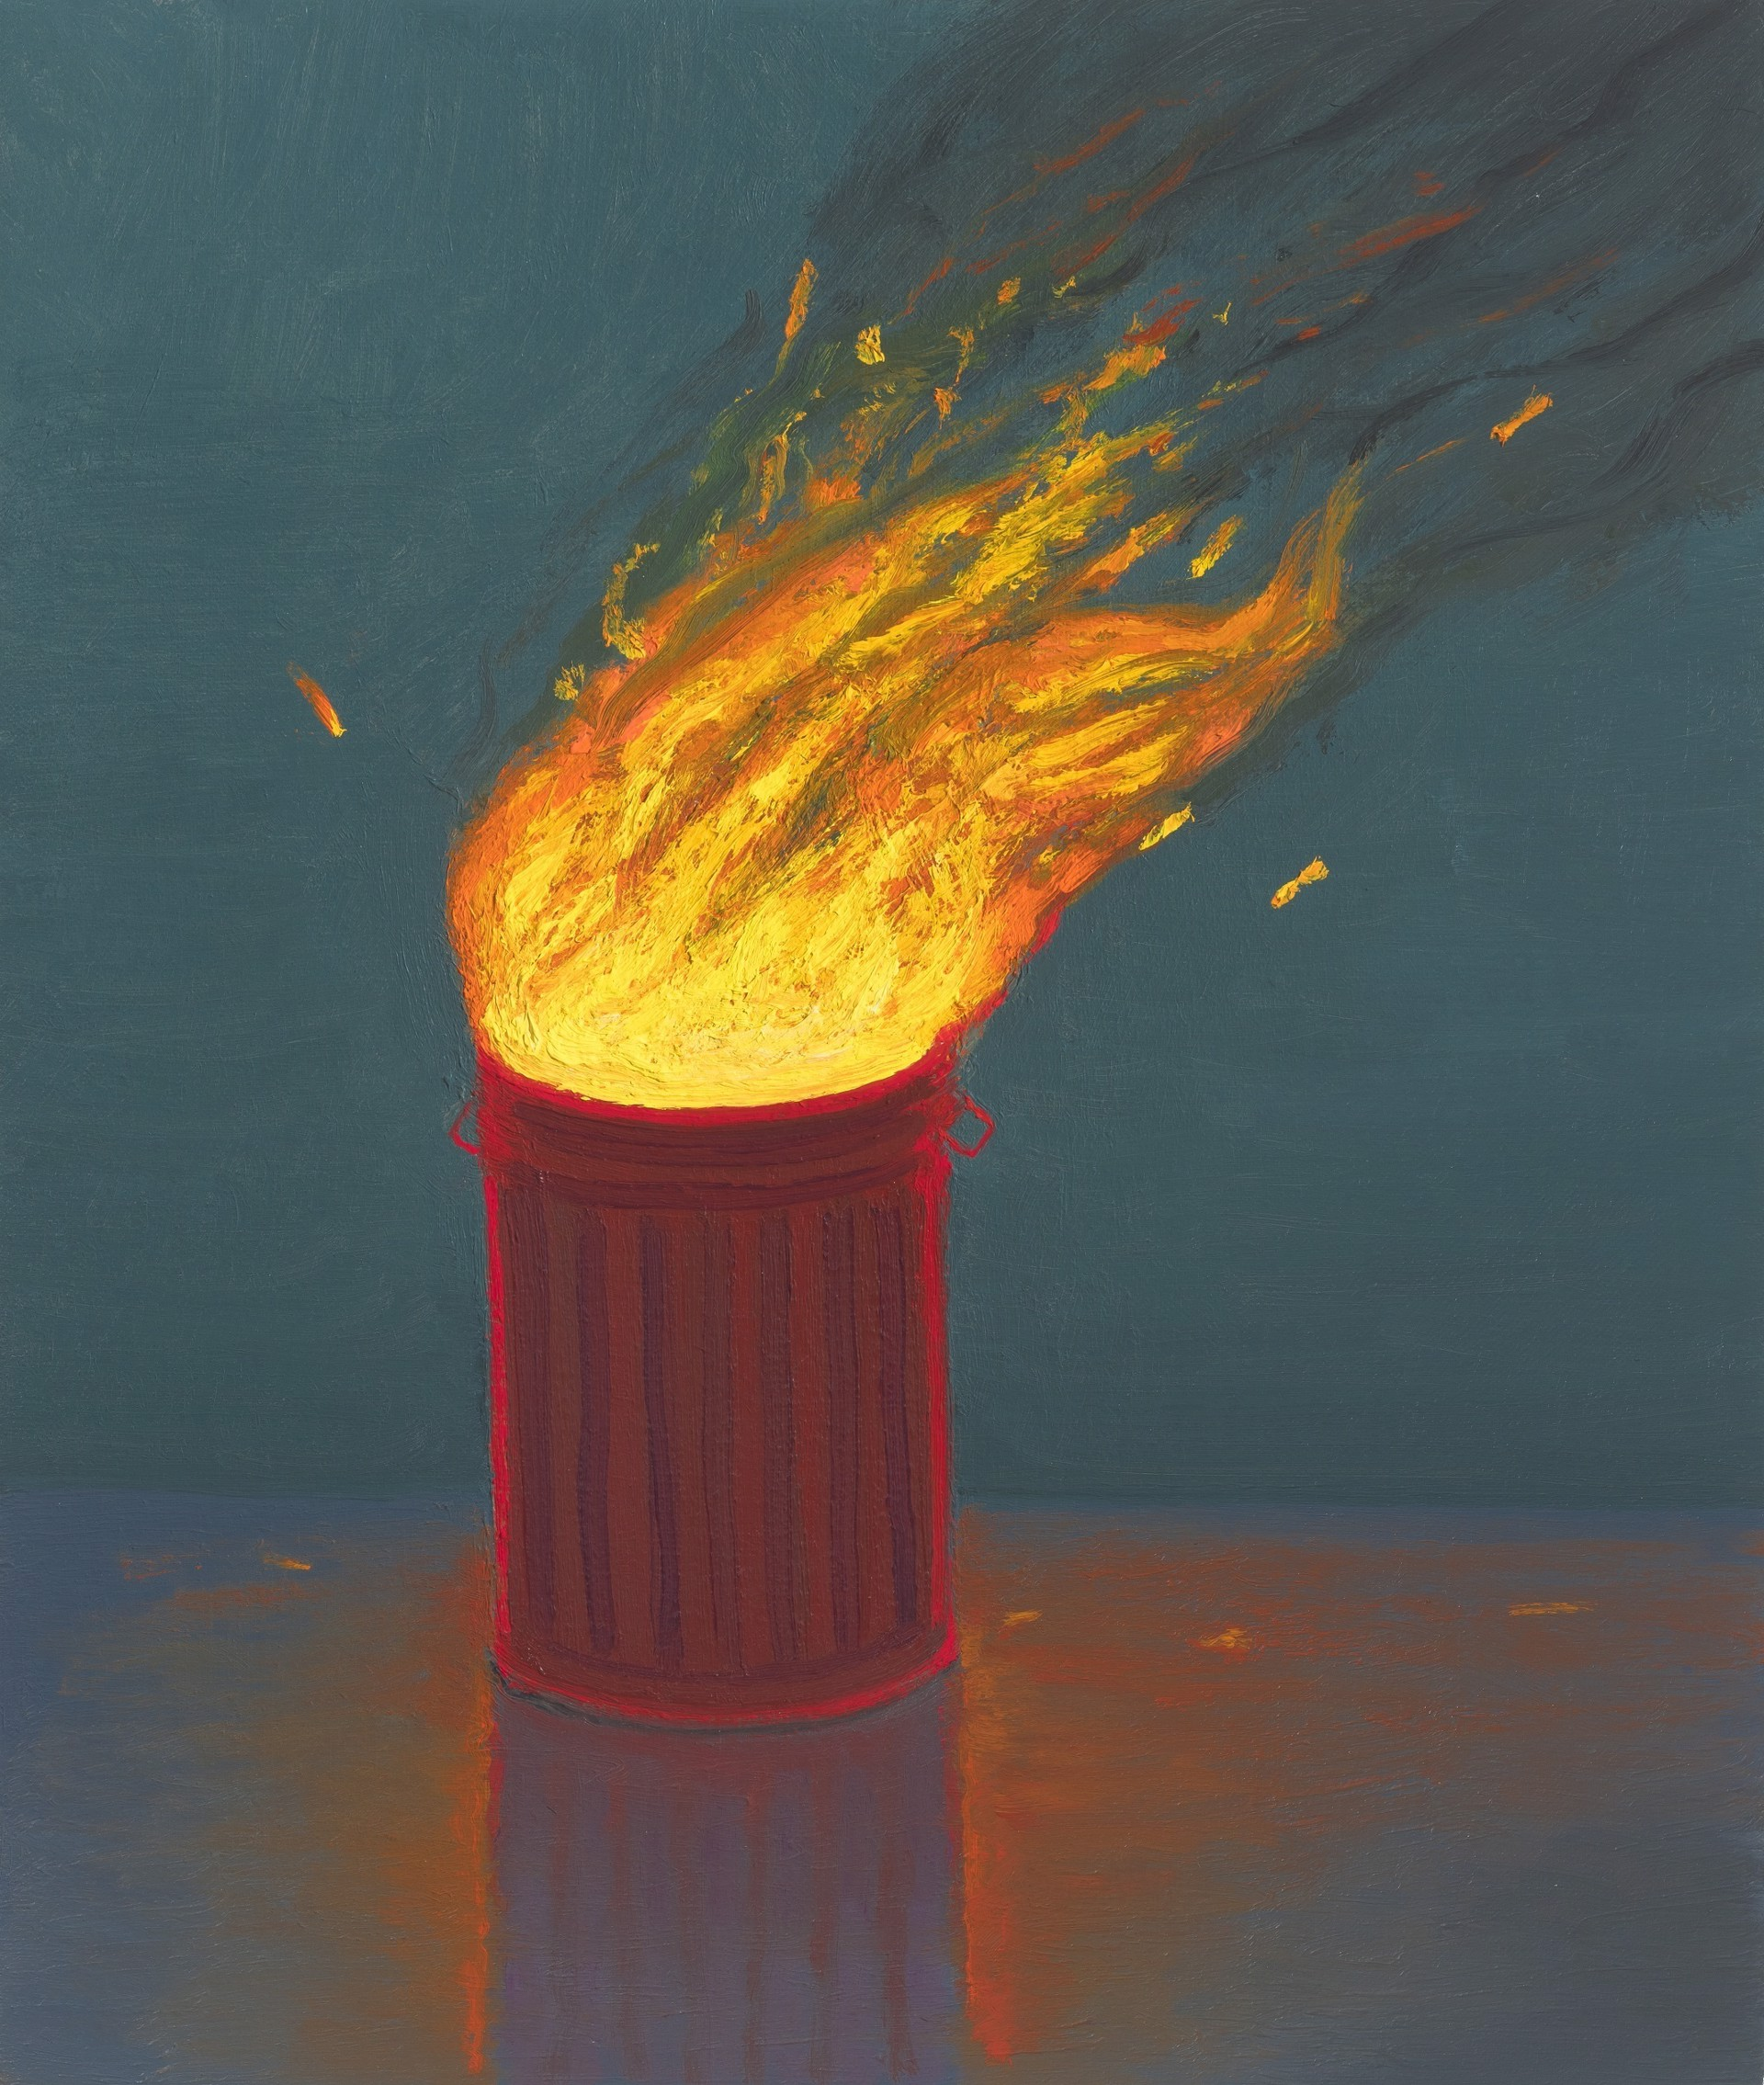 Trashfire II by Vonn Cummings Sumner